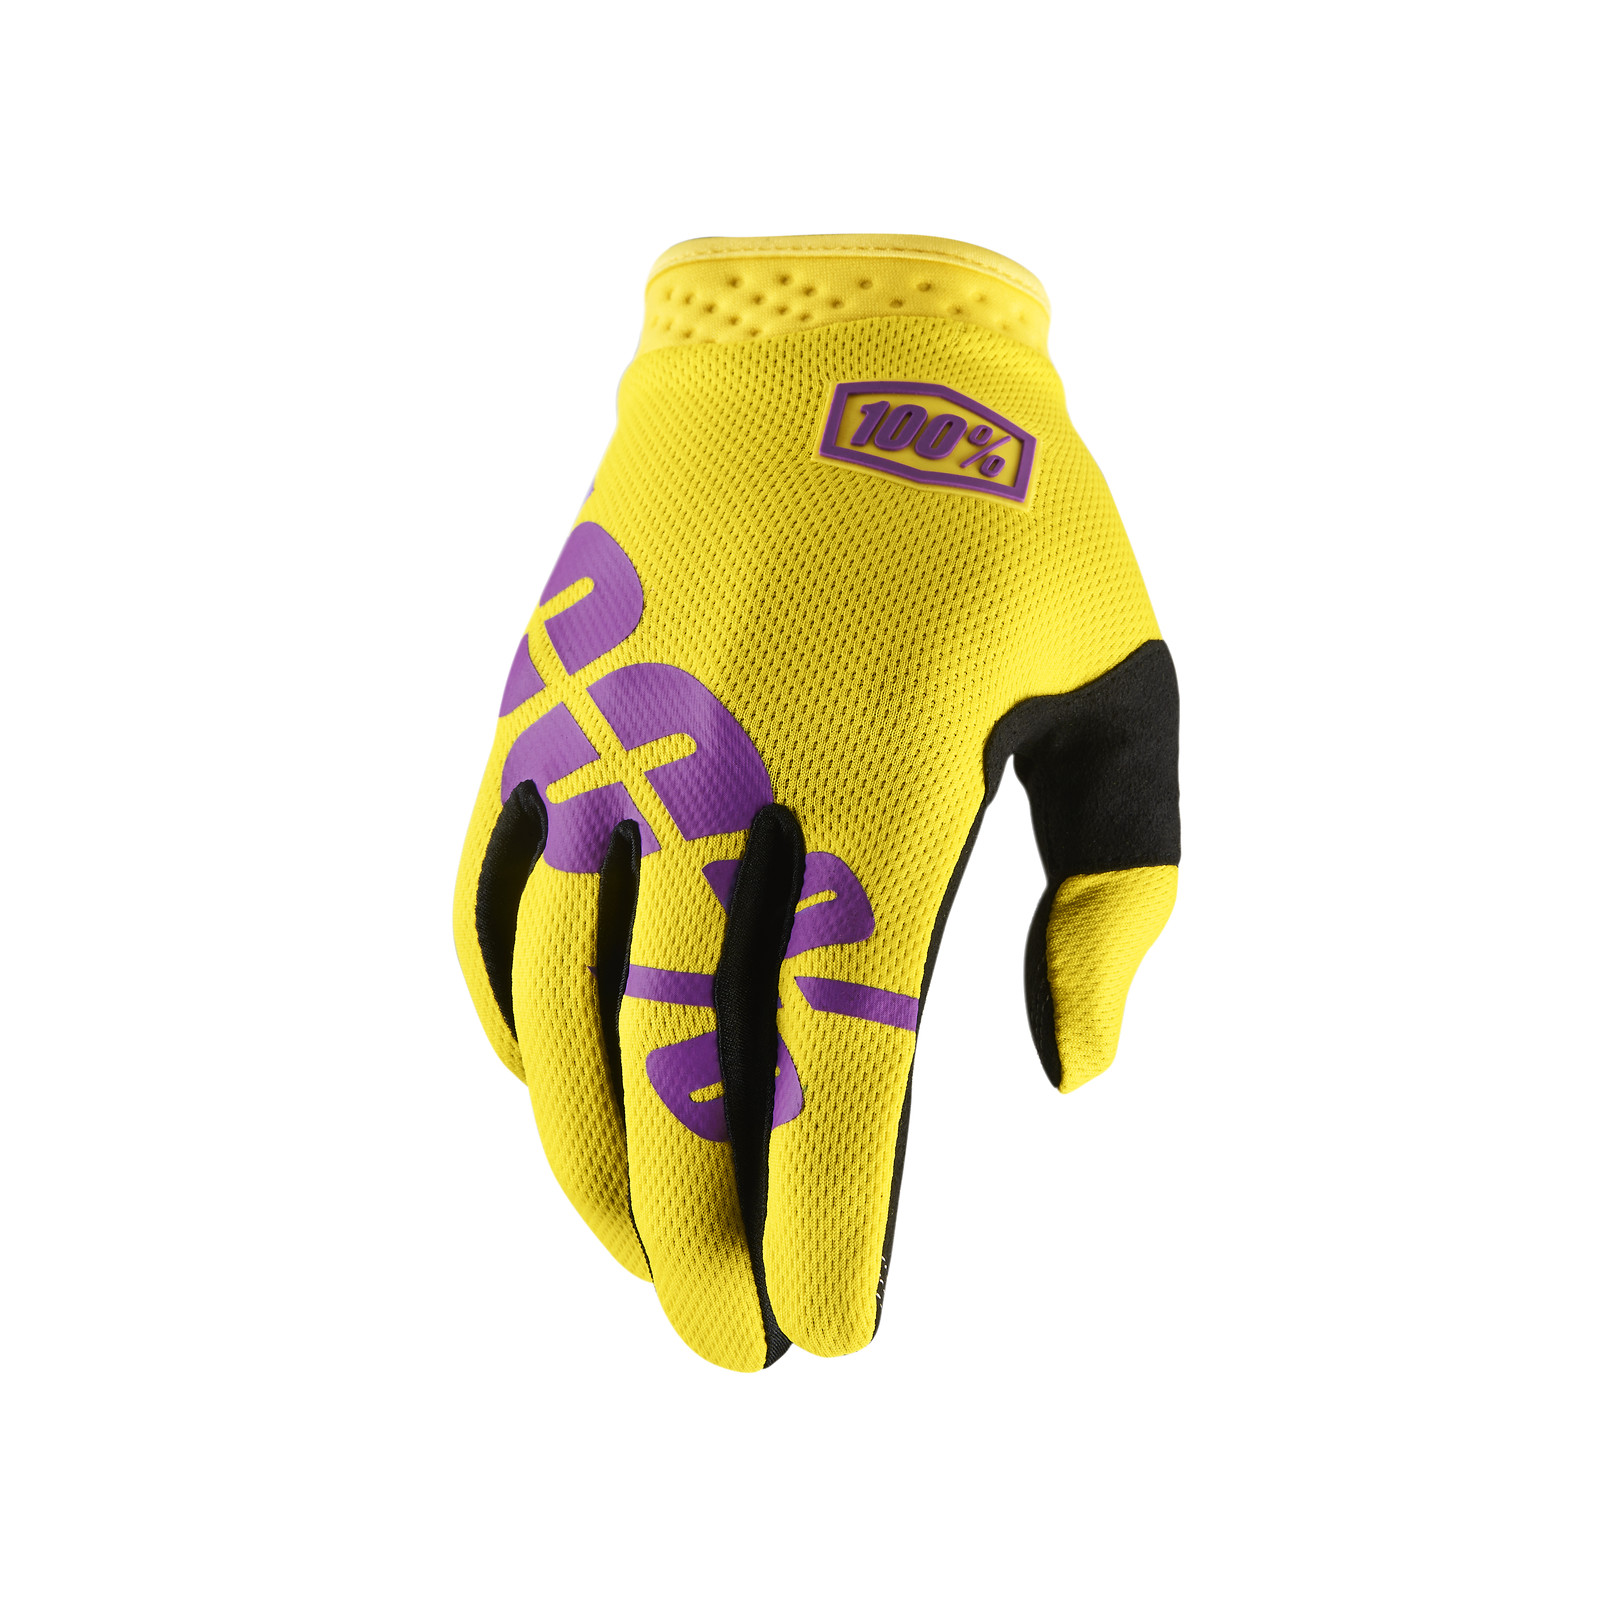 iTrack Glove - Yellow - 100percent - Motocross Pictures - Vital MX